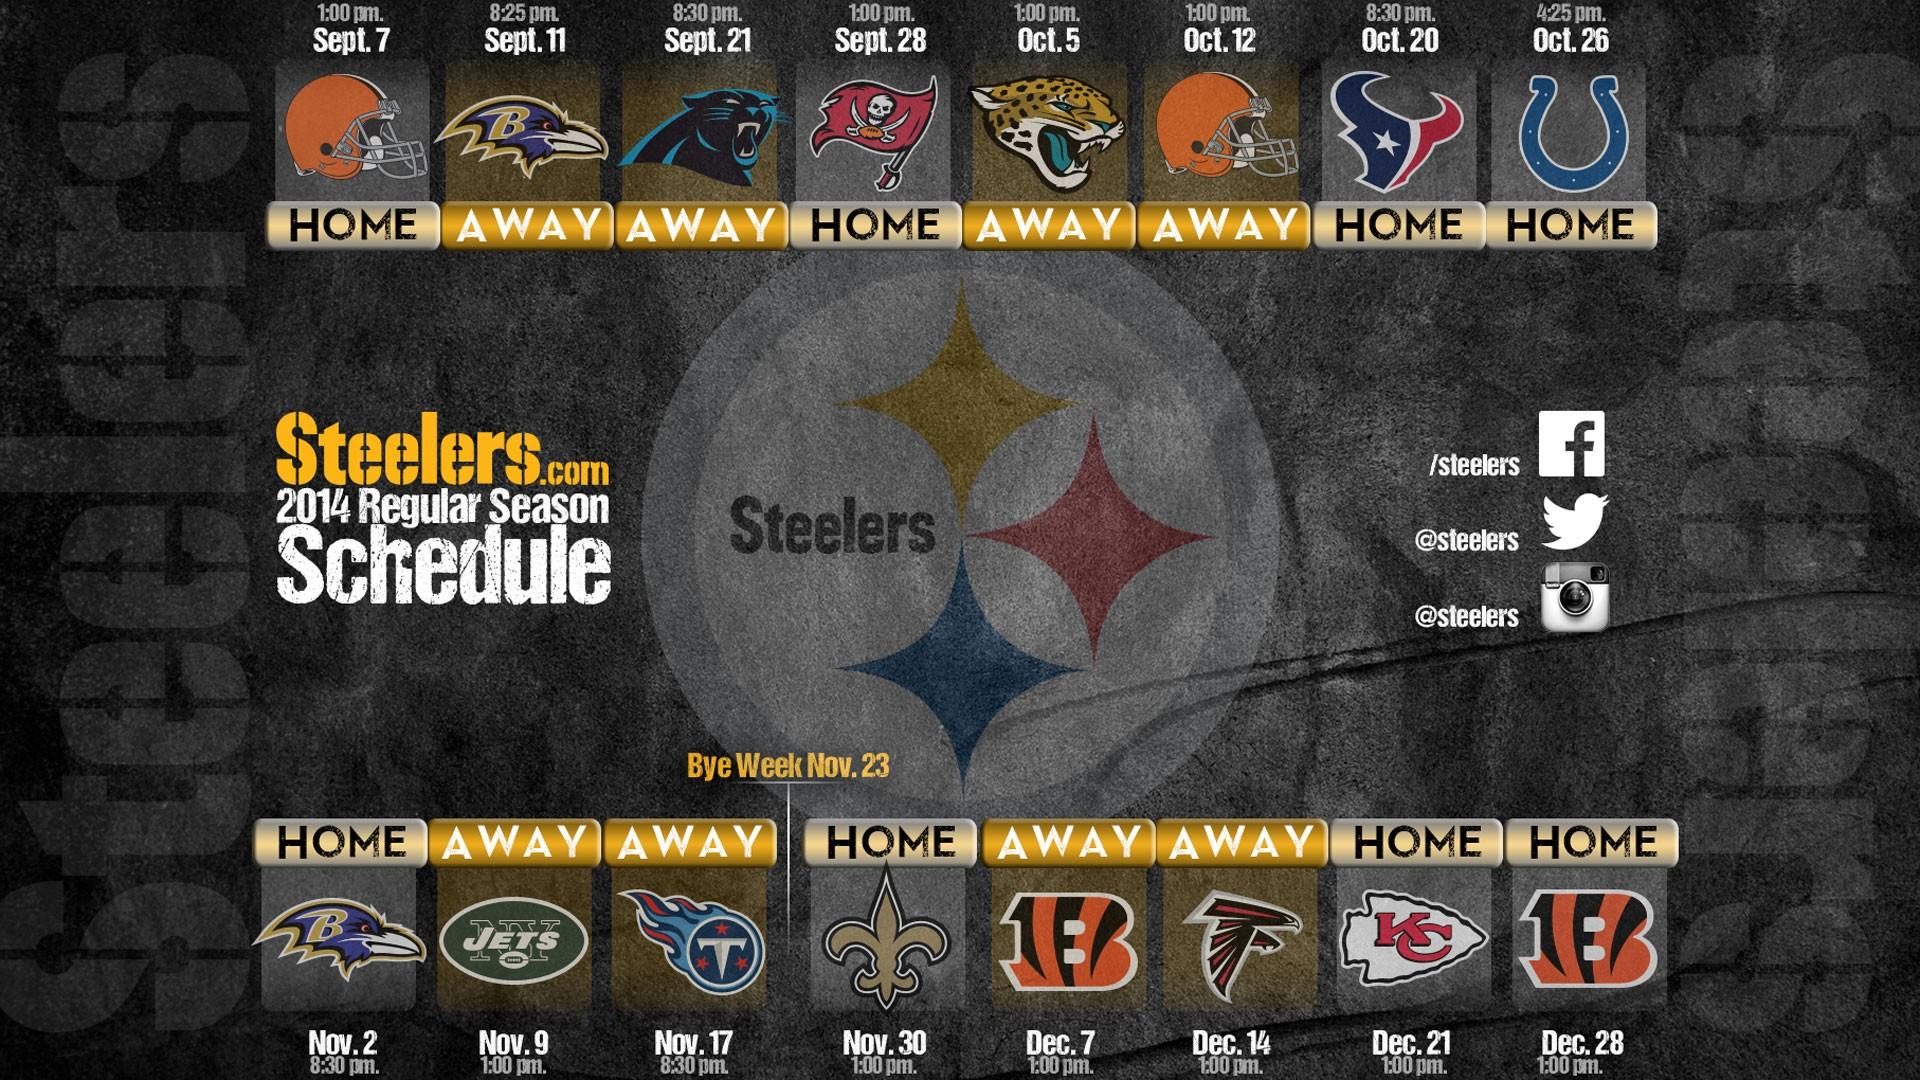 Pittsburgh Steelers Wallpaper Download Free Full Hd